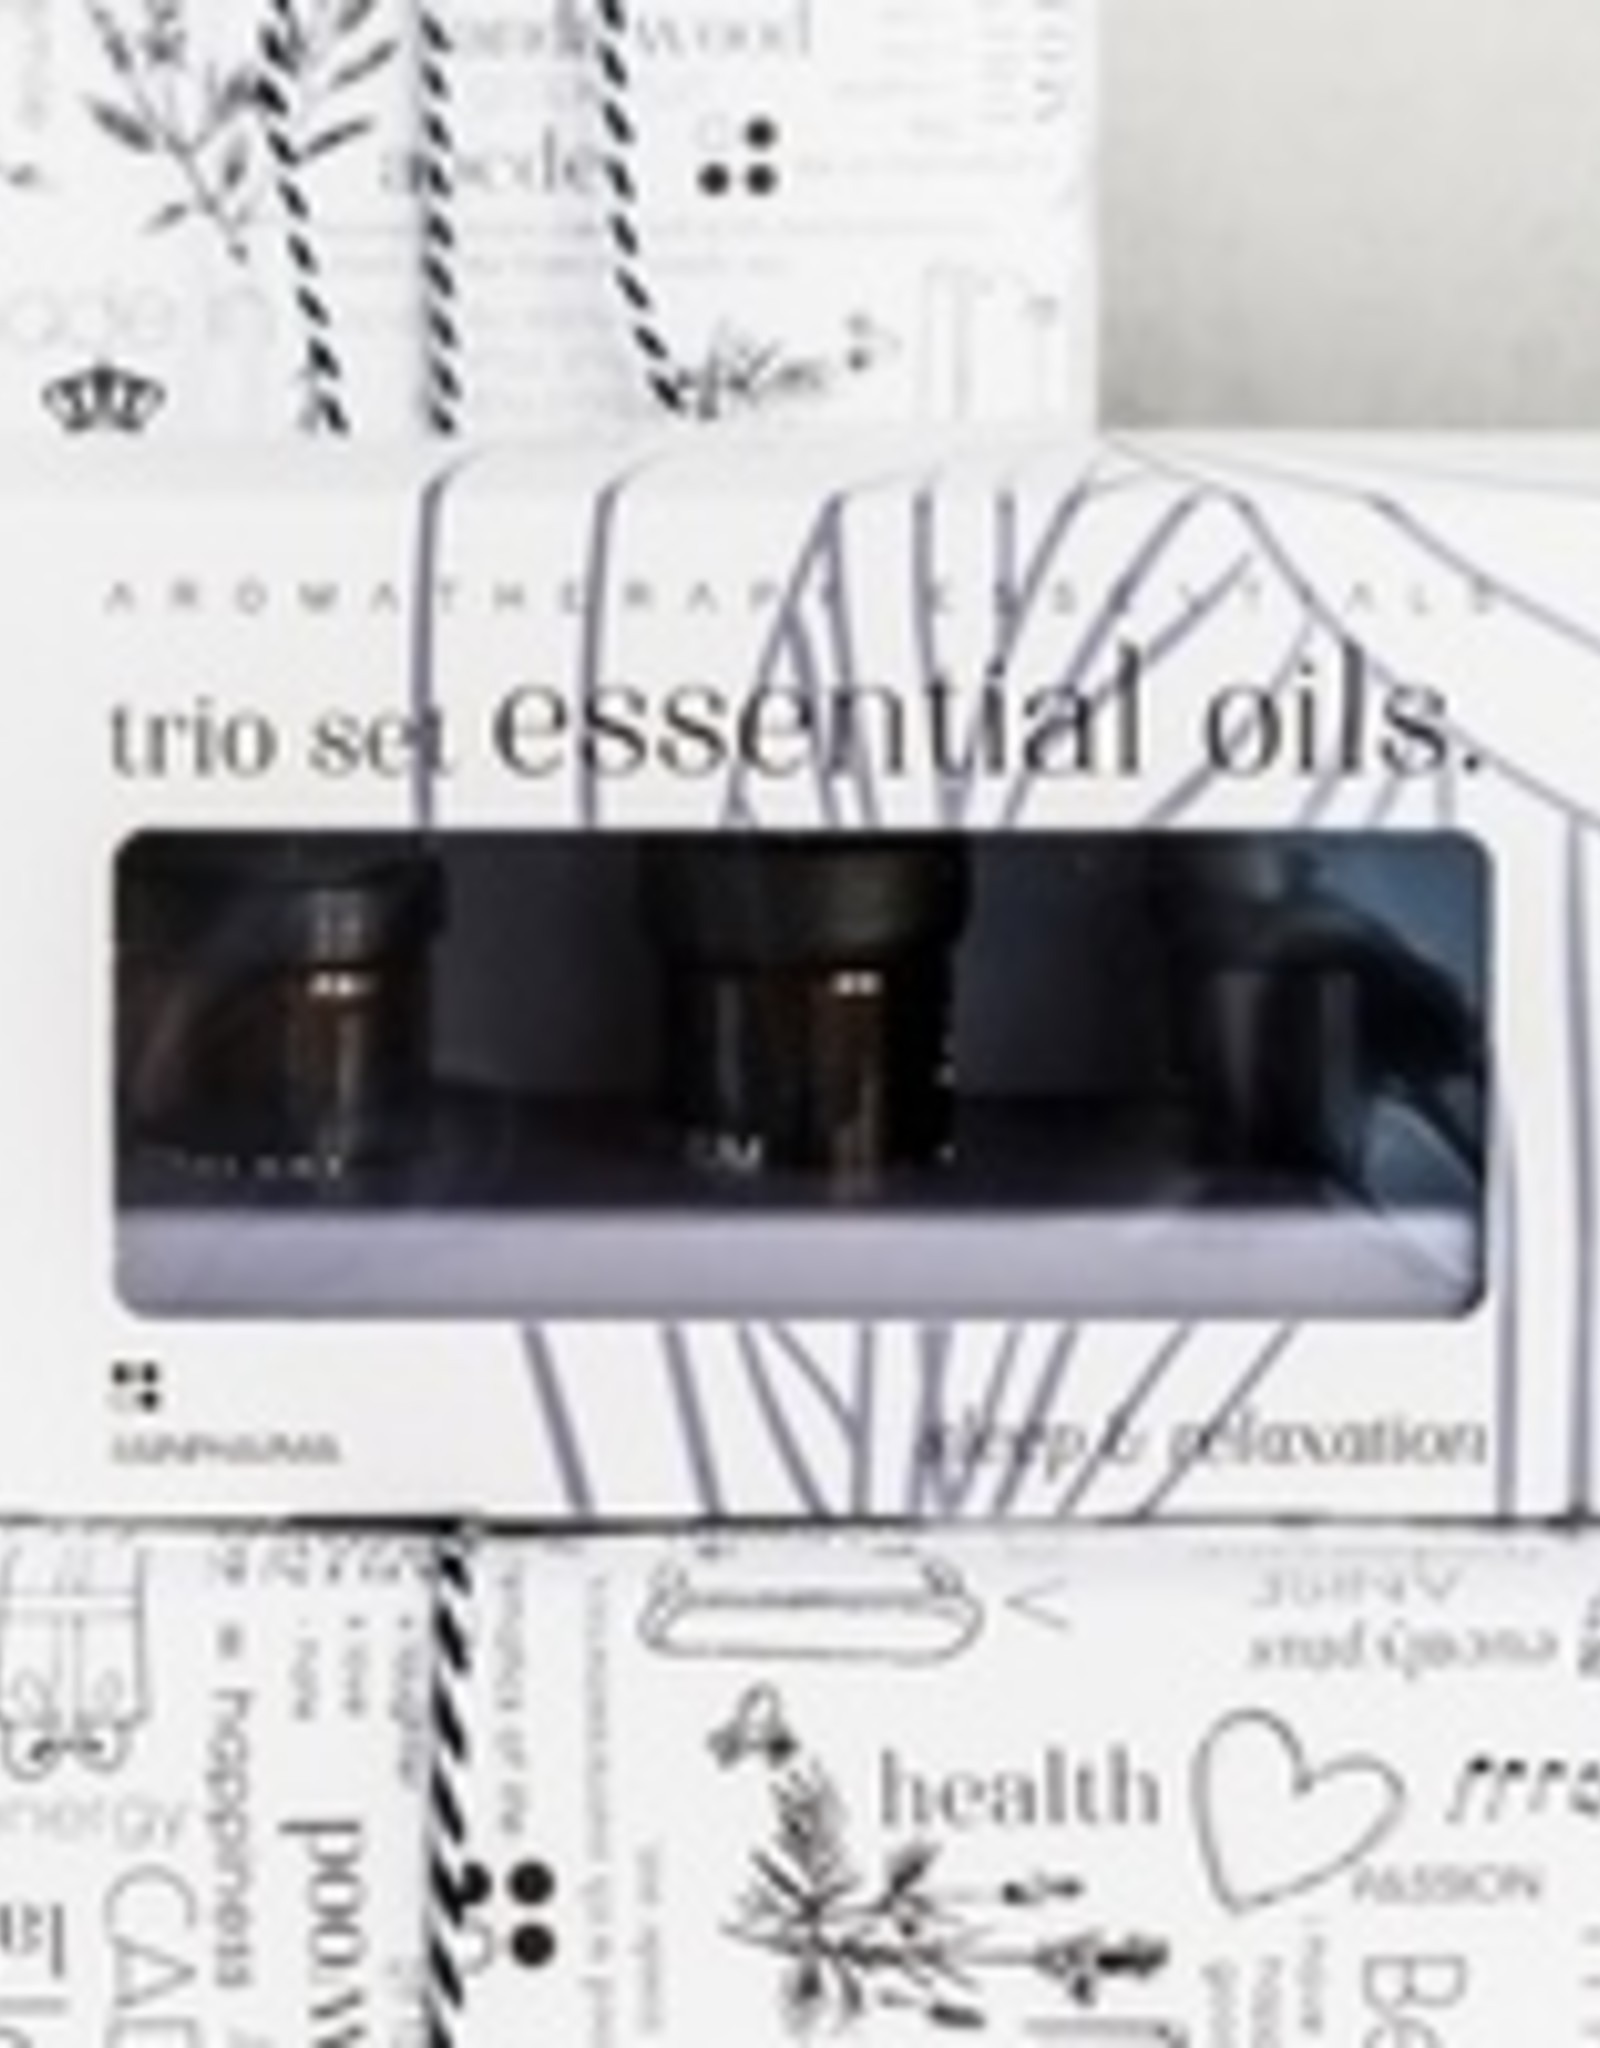 RainPharma Rainpharma - Trio Essential Oils - Sleep & Relaxation